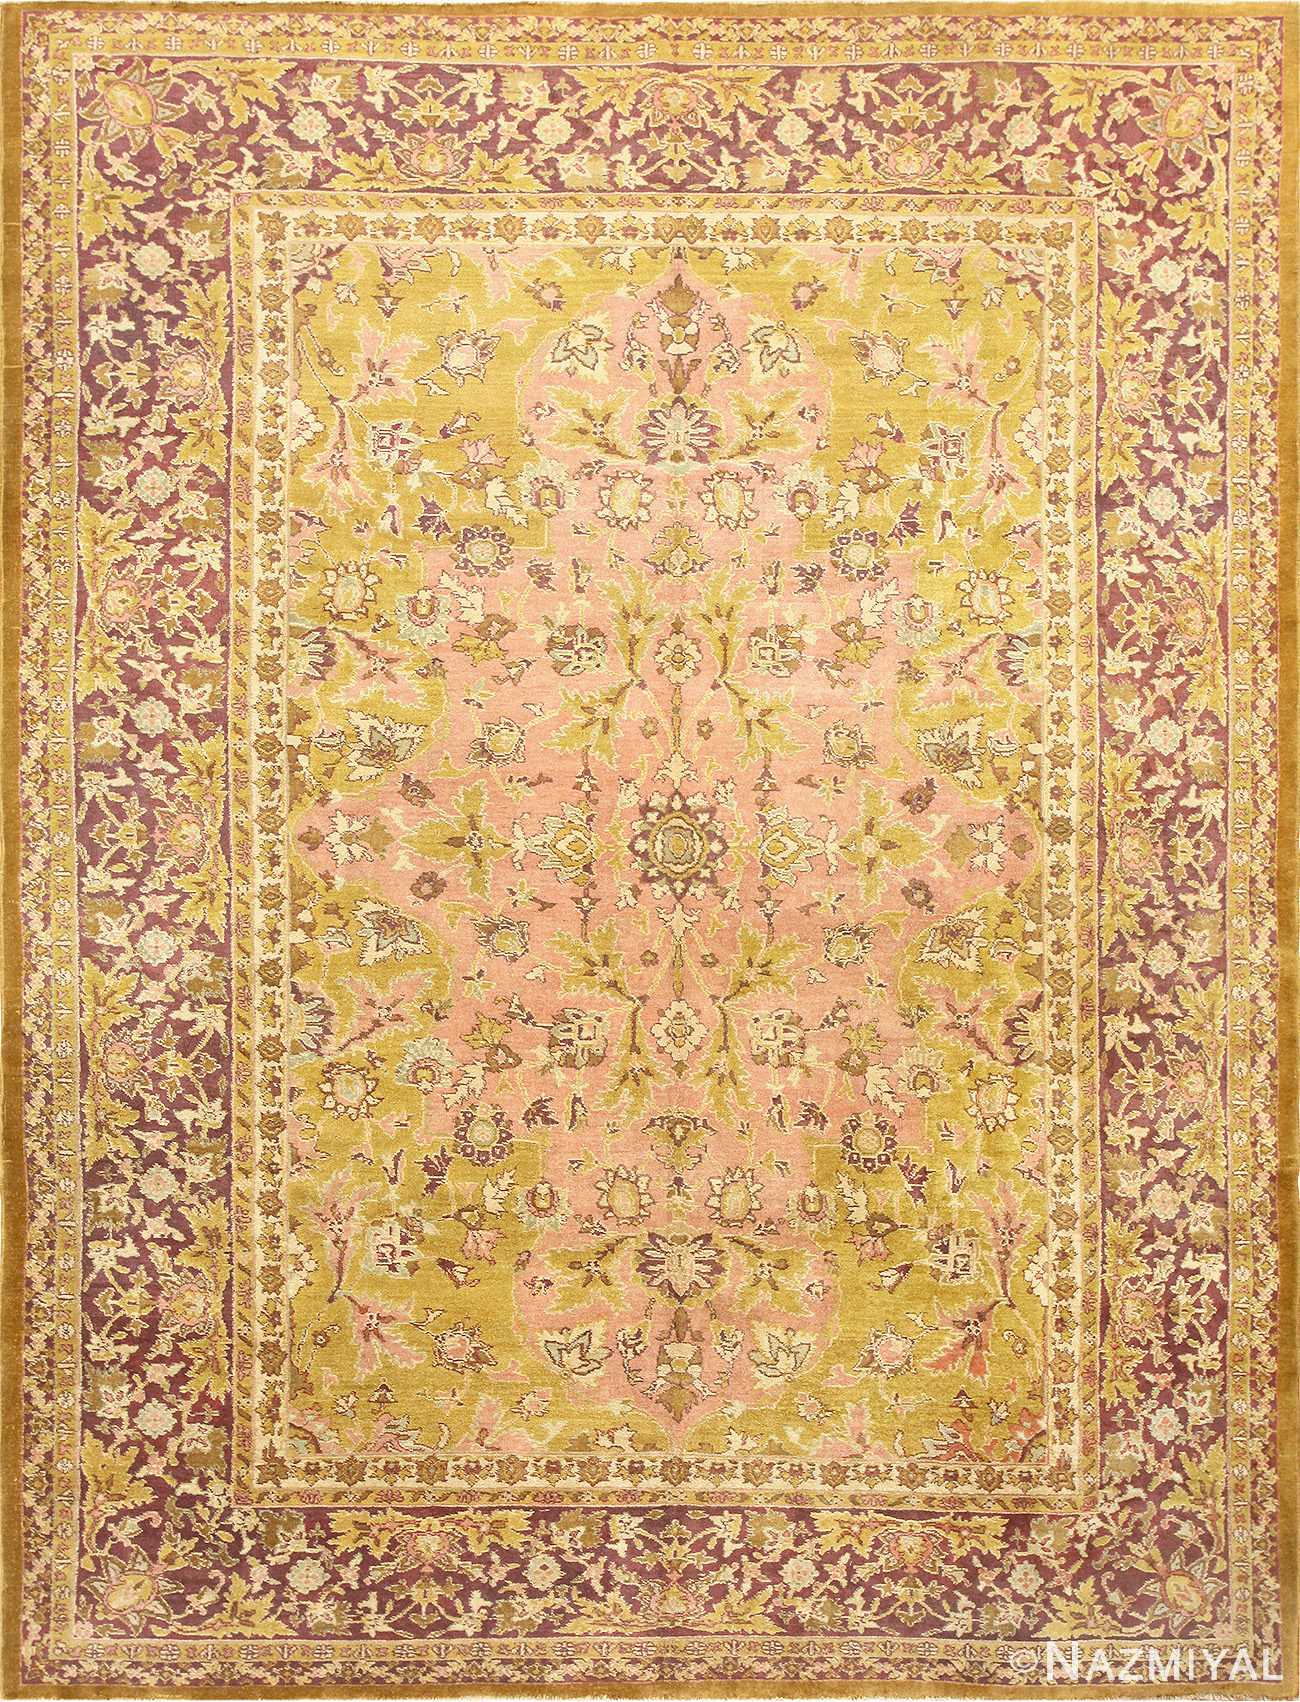 Polonaise antique oriental rugs - Polonaise Antique Oriental Rugs 3